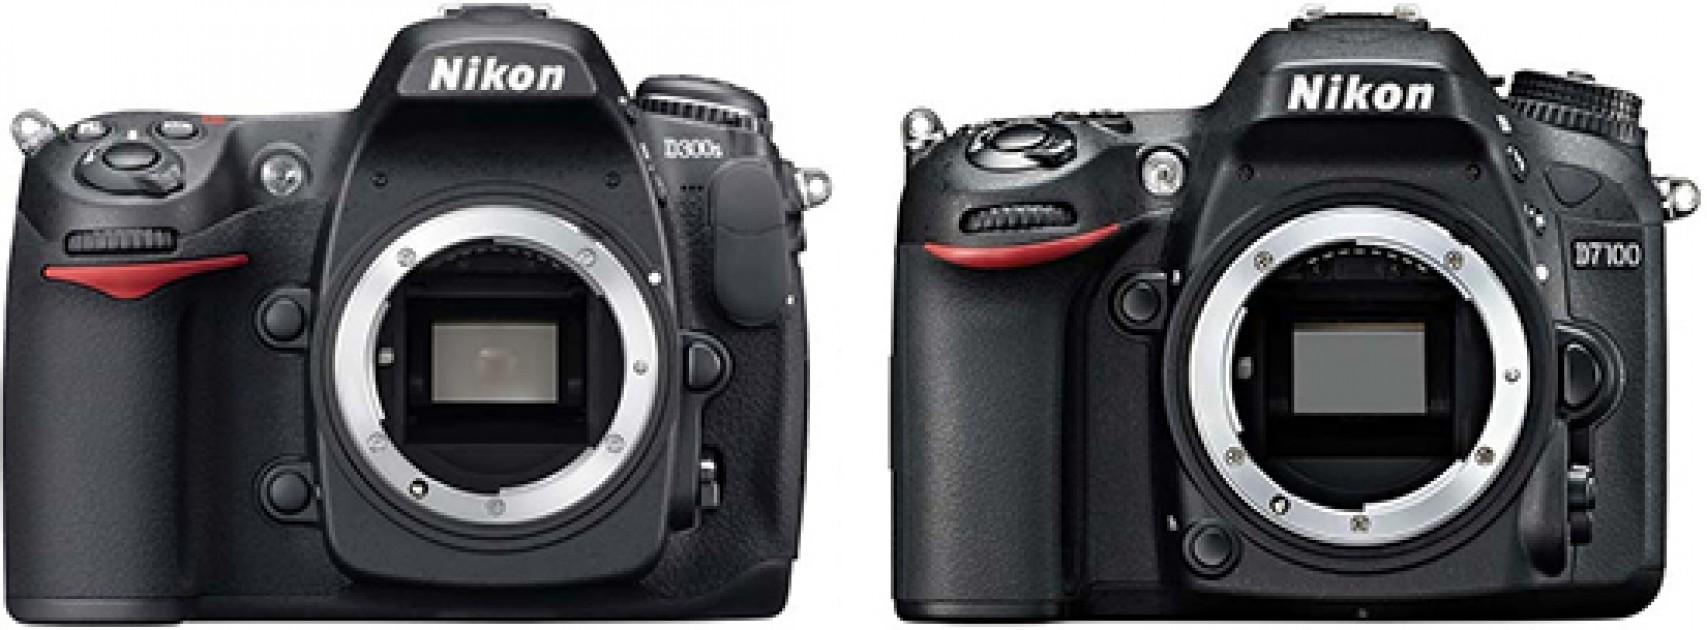 Nikon D300S vs D7100 - Key Differences | Photography Blog